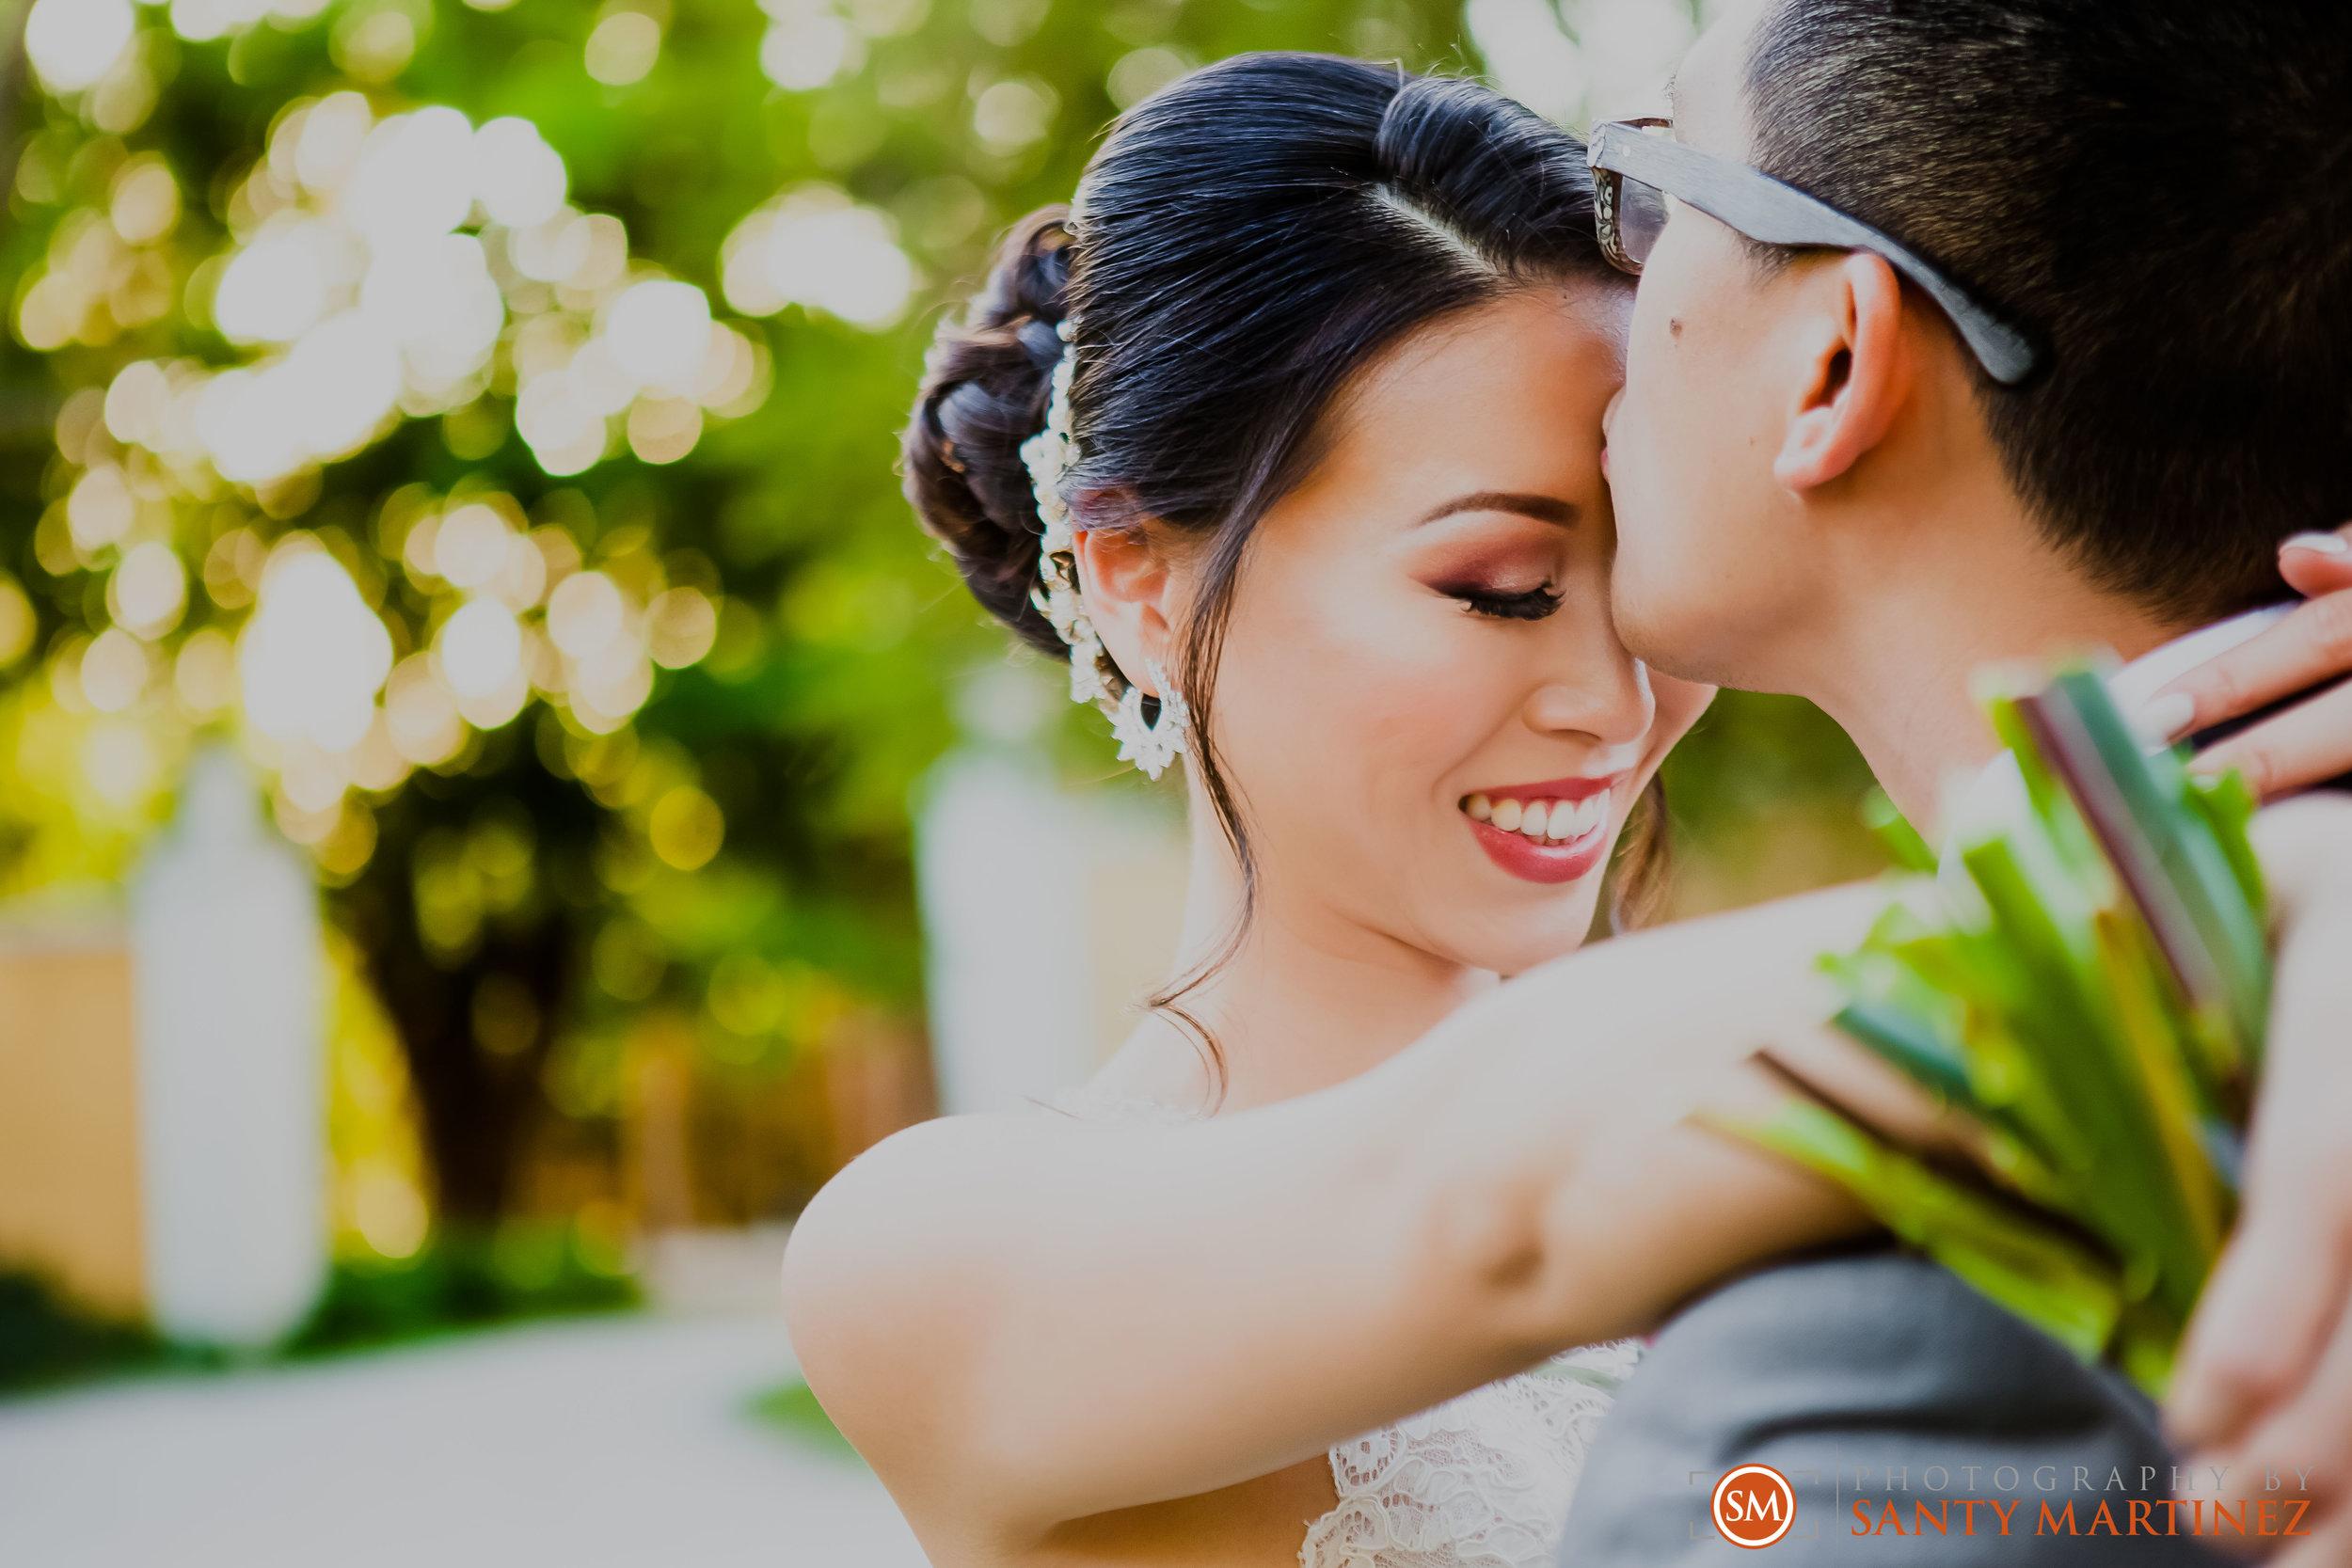 Wedding Bonnet House - Photography by Santy Martinez-19.jpg